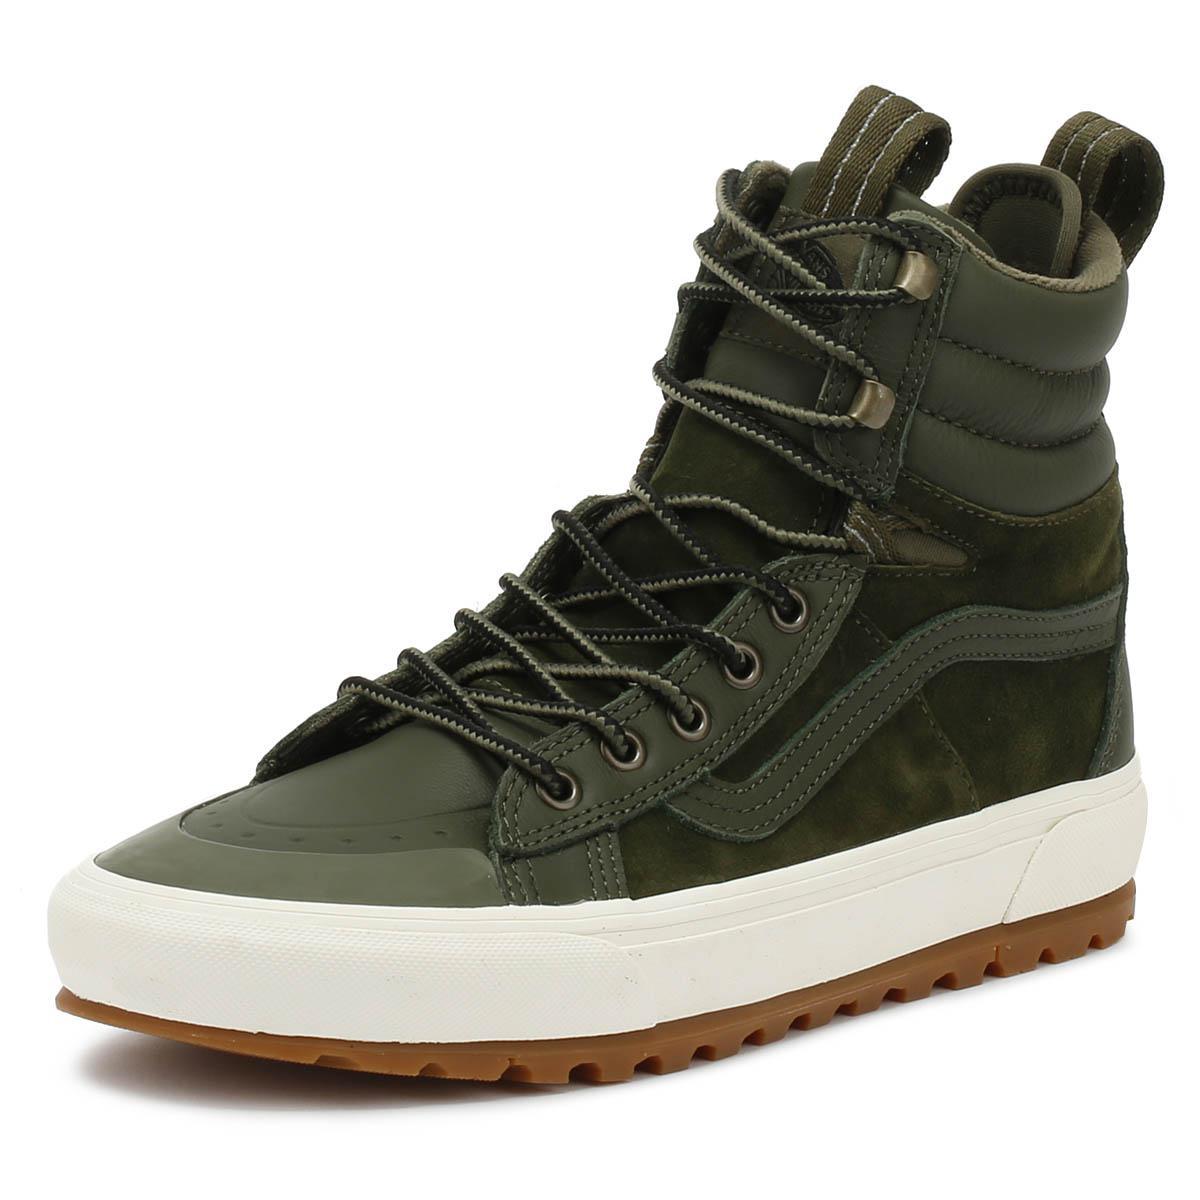 399430a59cb28c Lyst - Vans Sk8-hi Mte Dx Grape Leaf Green Boots in Green for Men